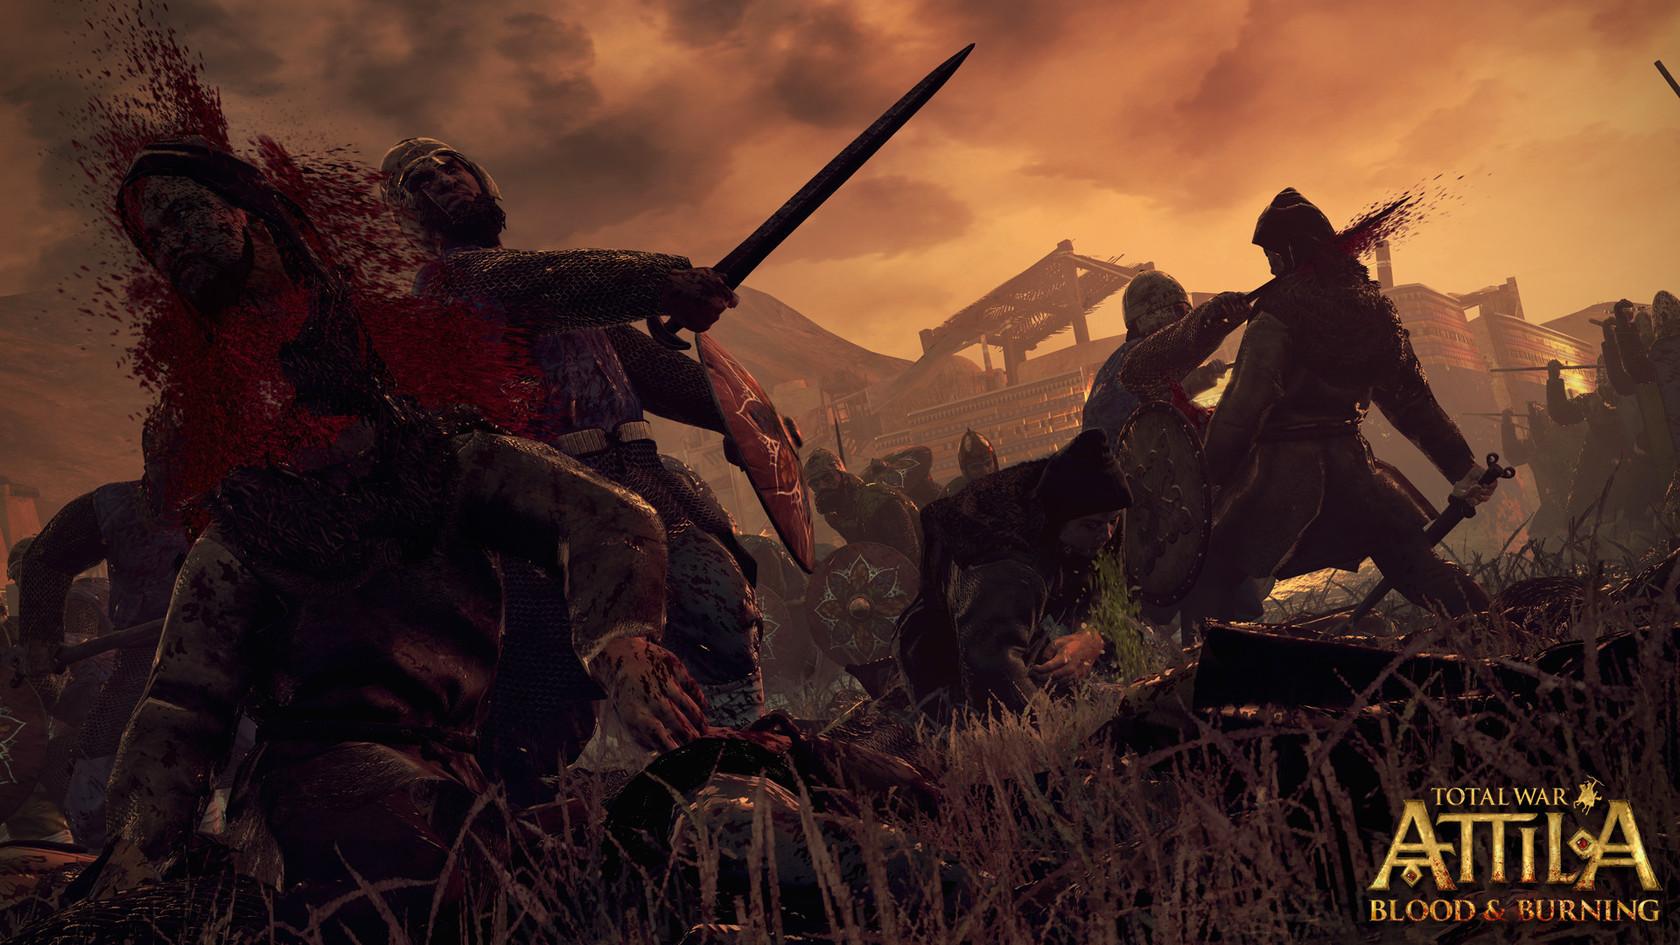 Attila Total War Wallpaper: Total War™: ATTILA - Blood And Burning Pack